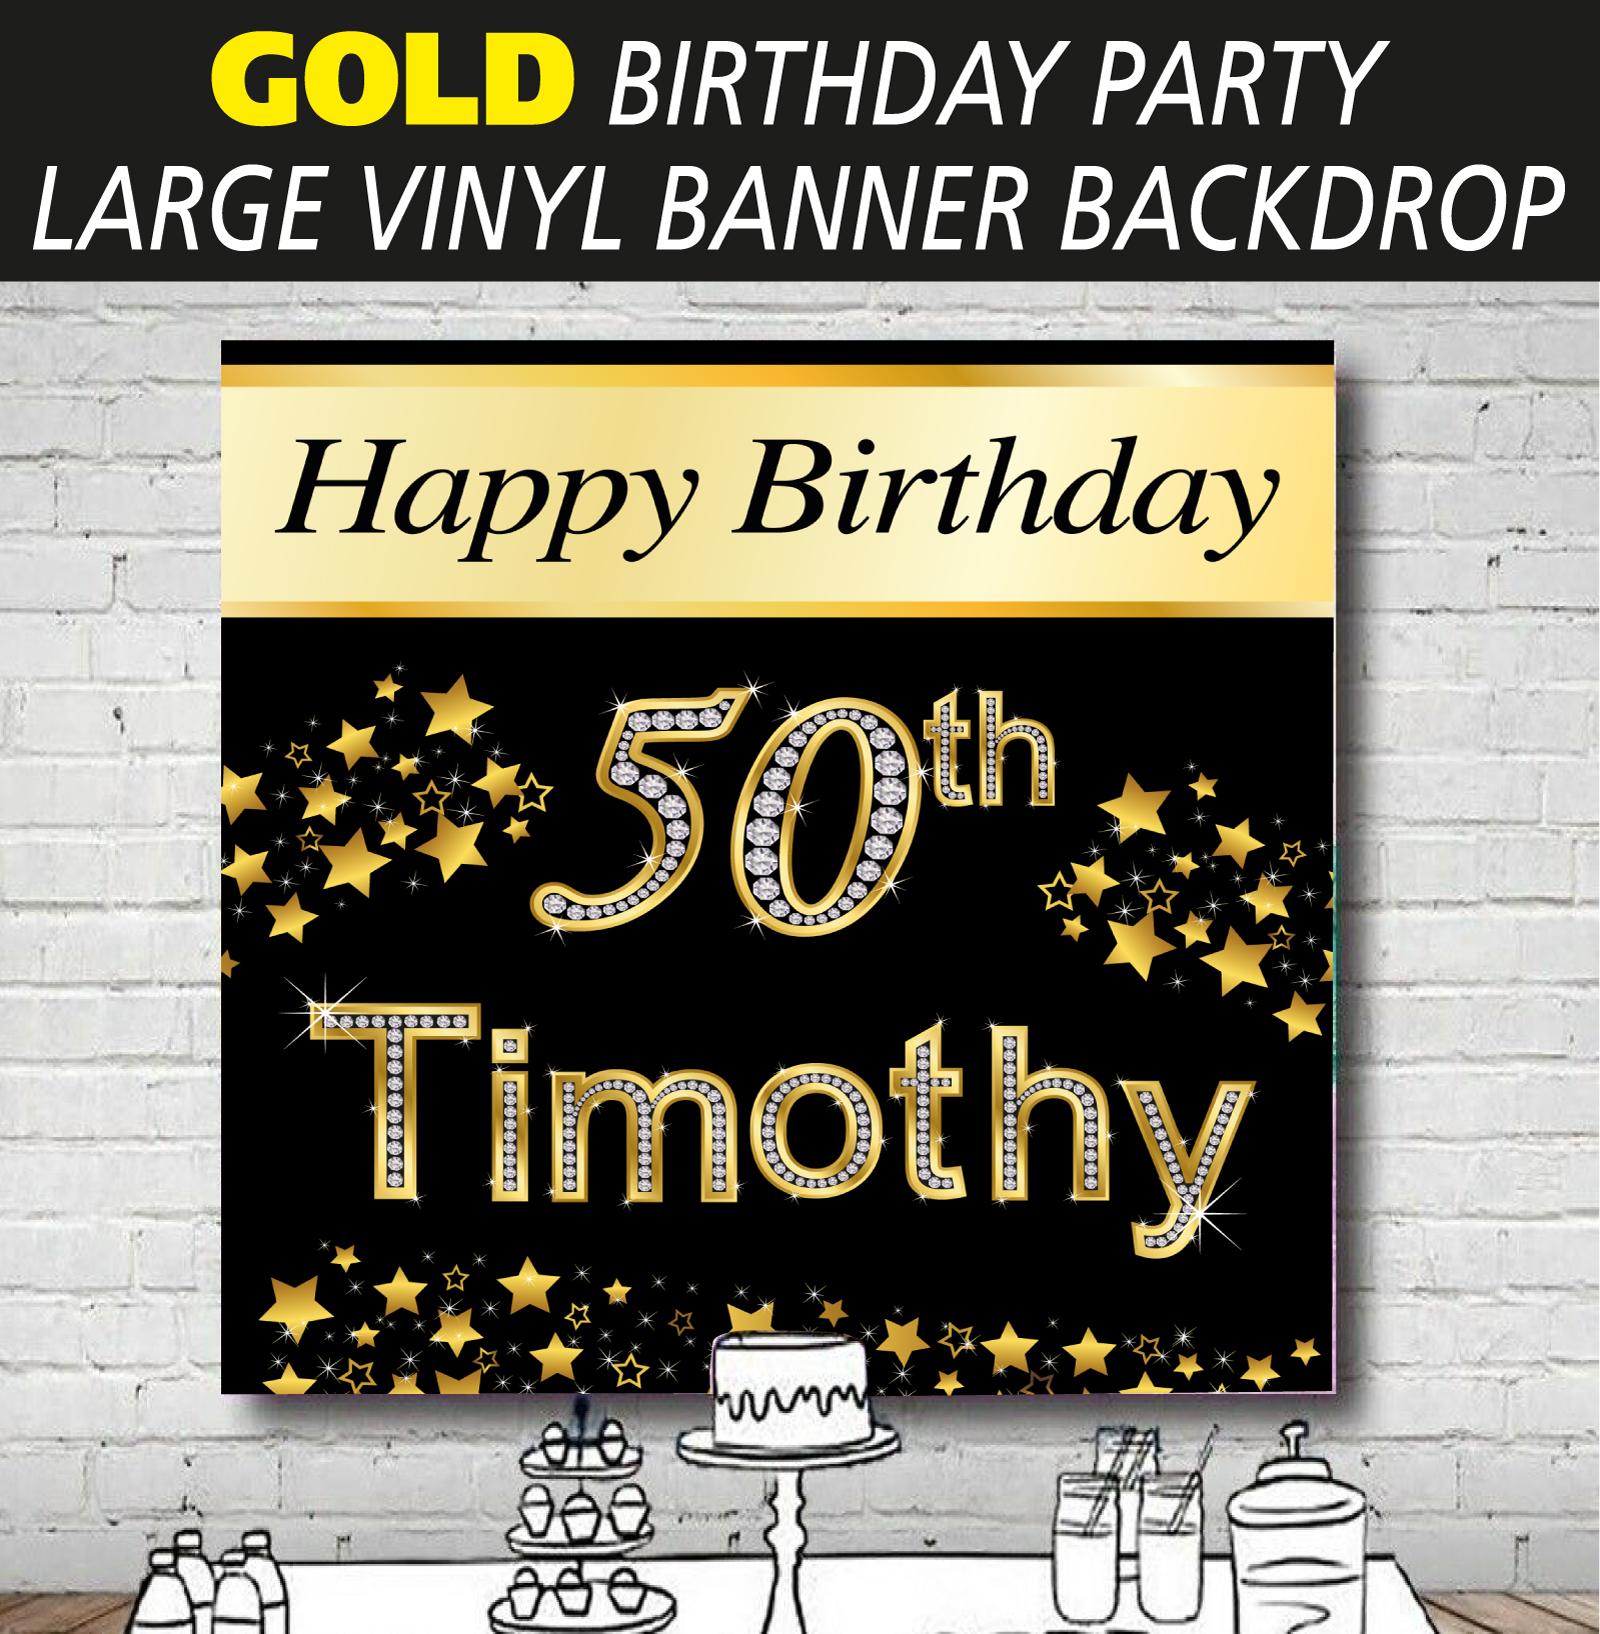 gold-party-backdrop-banner-ebay.jpg